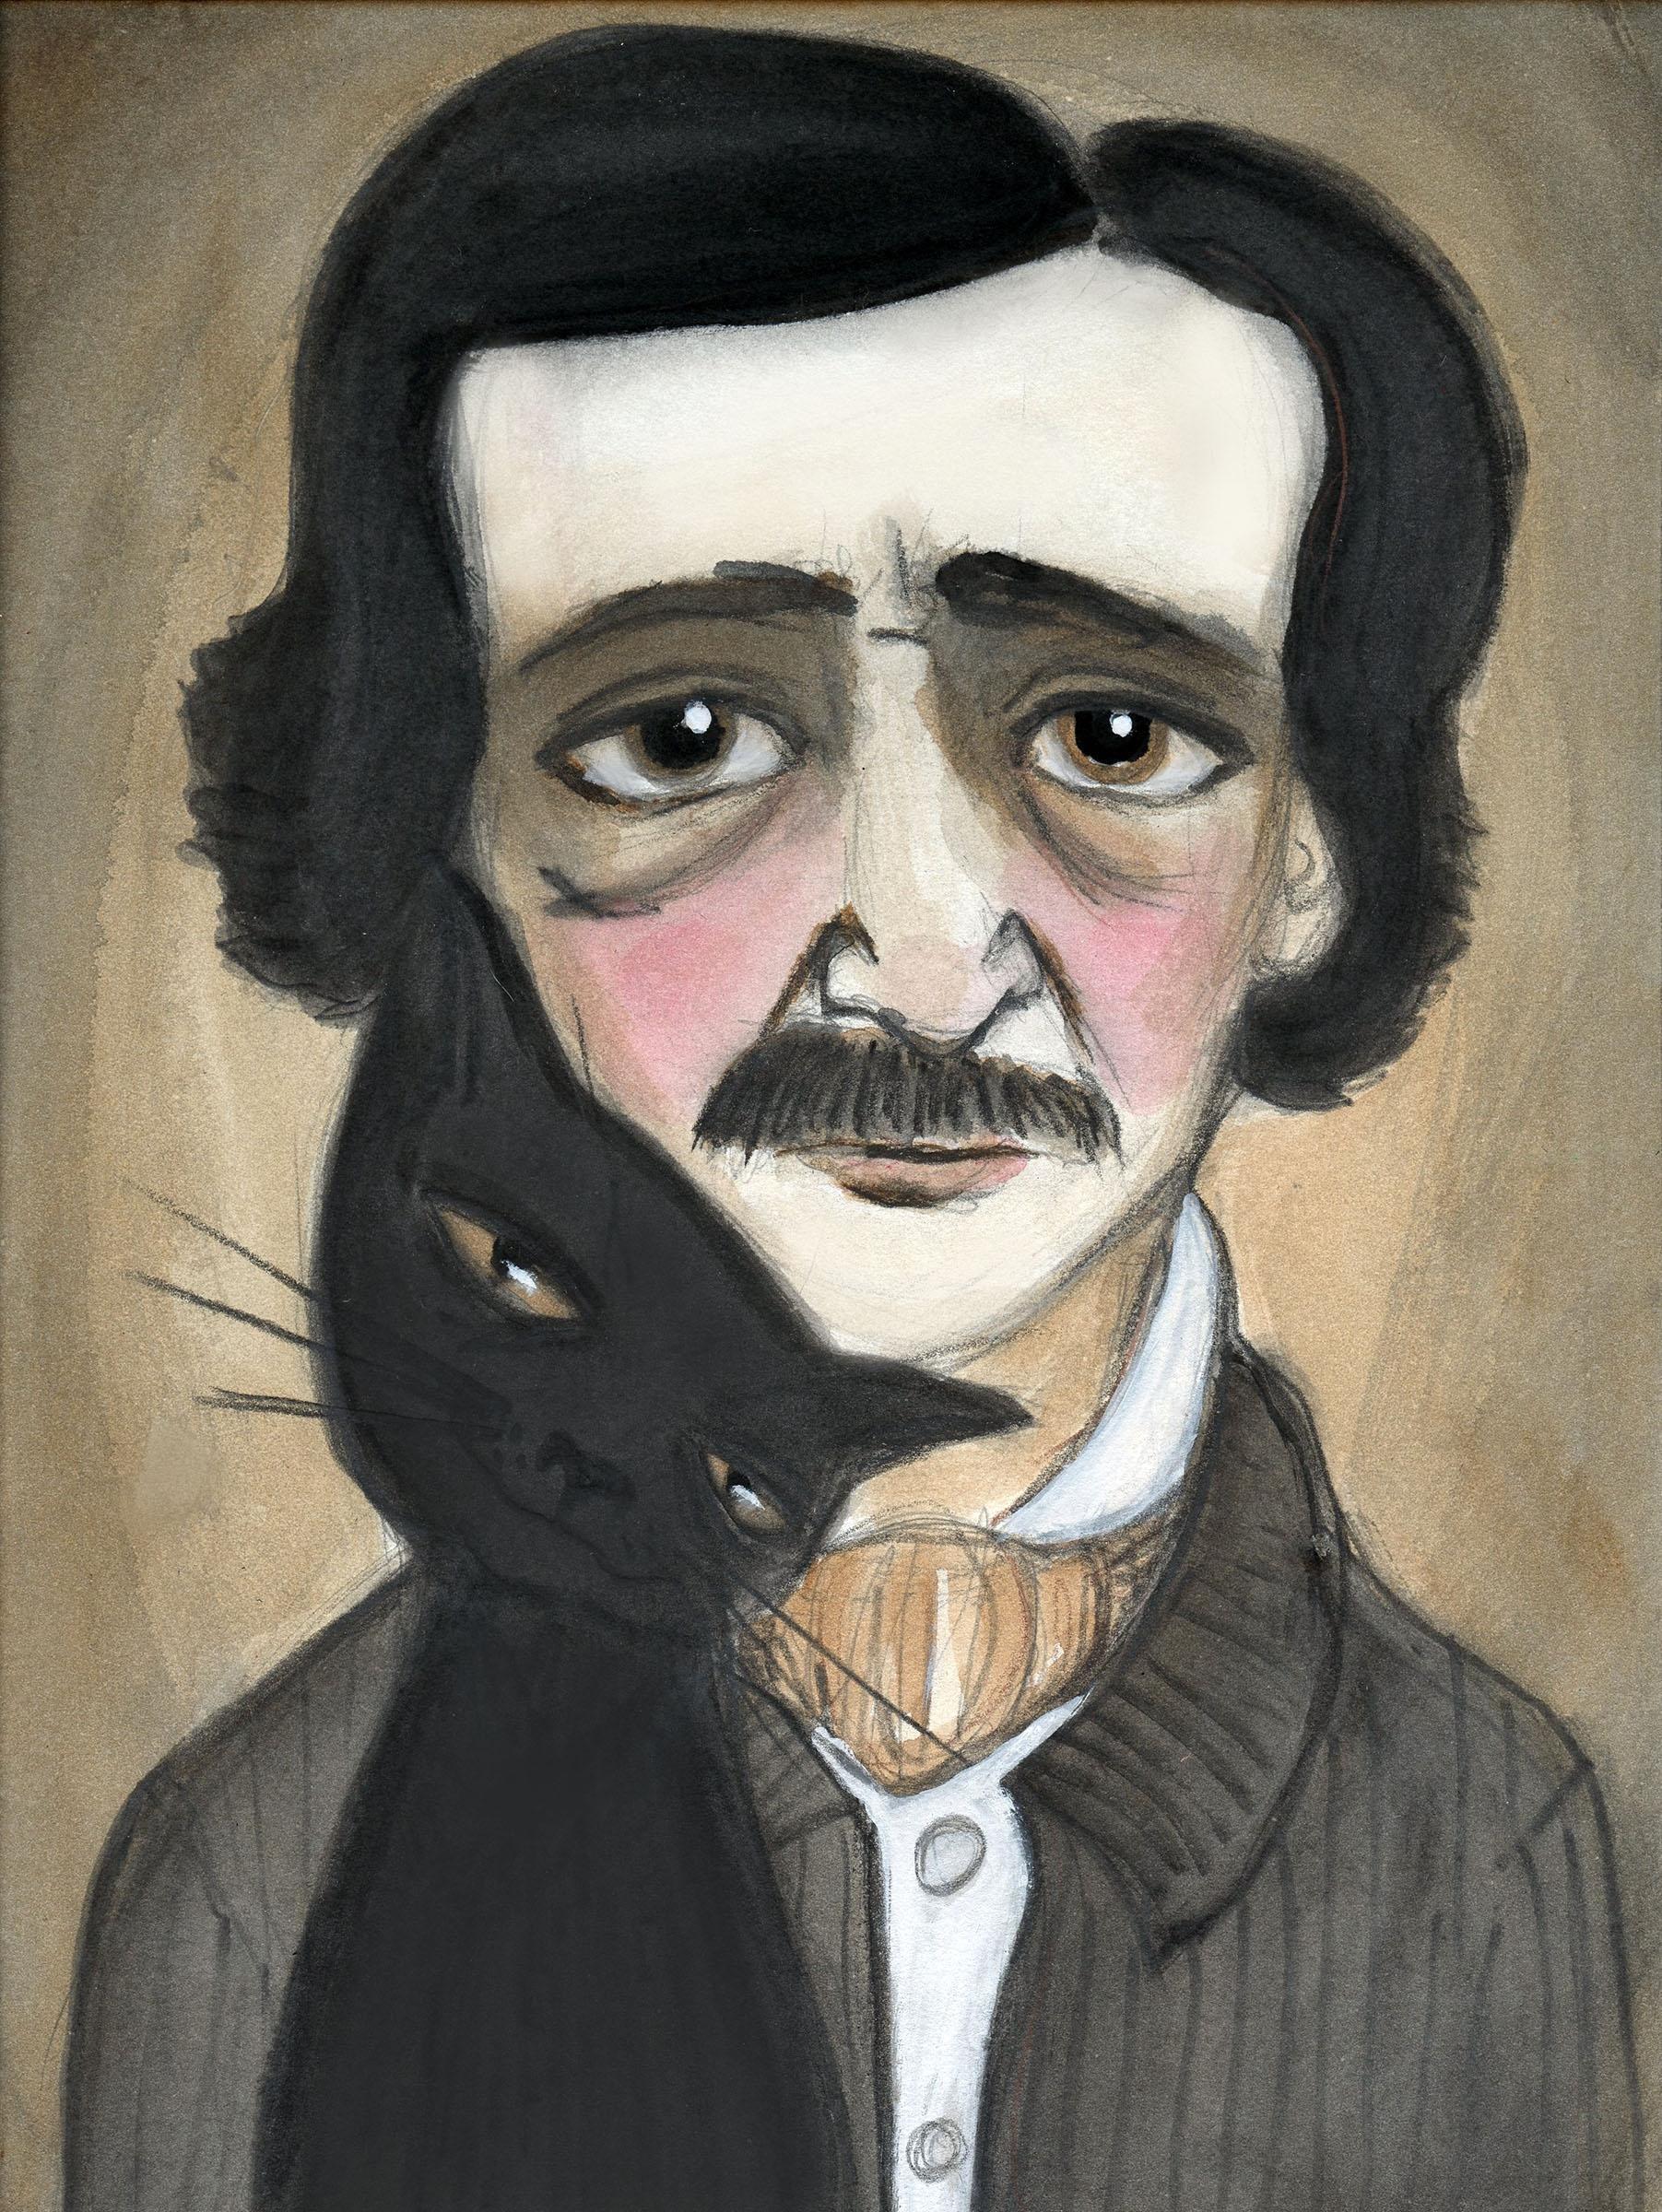 Edgar Allan Poe and the Black Cat